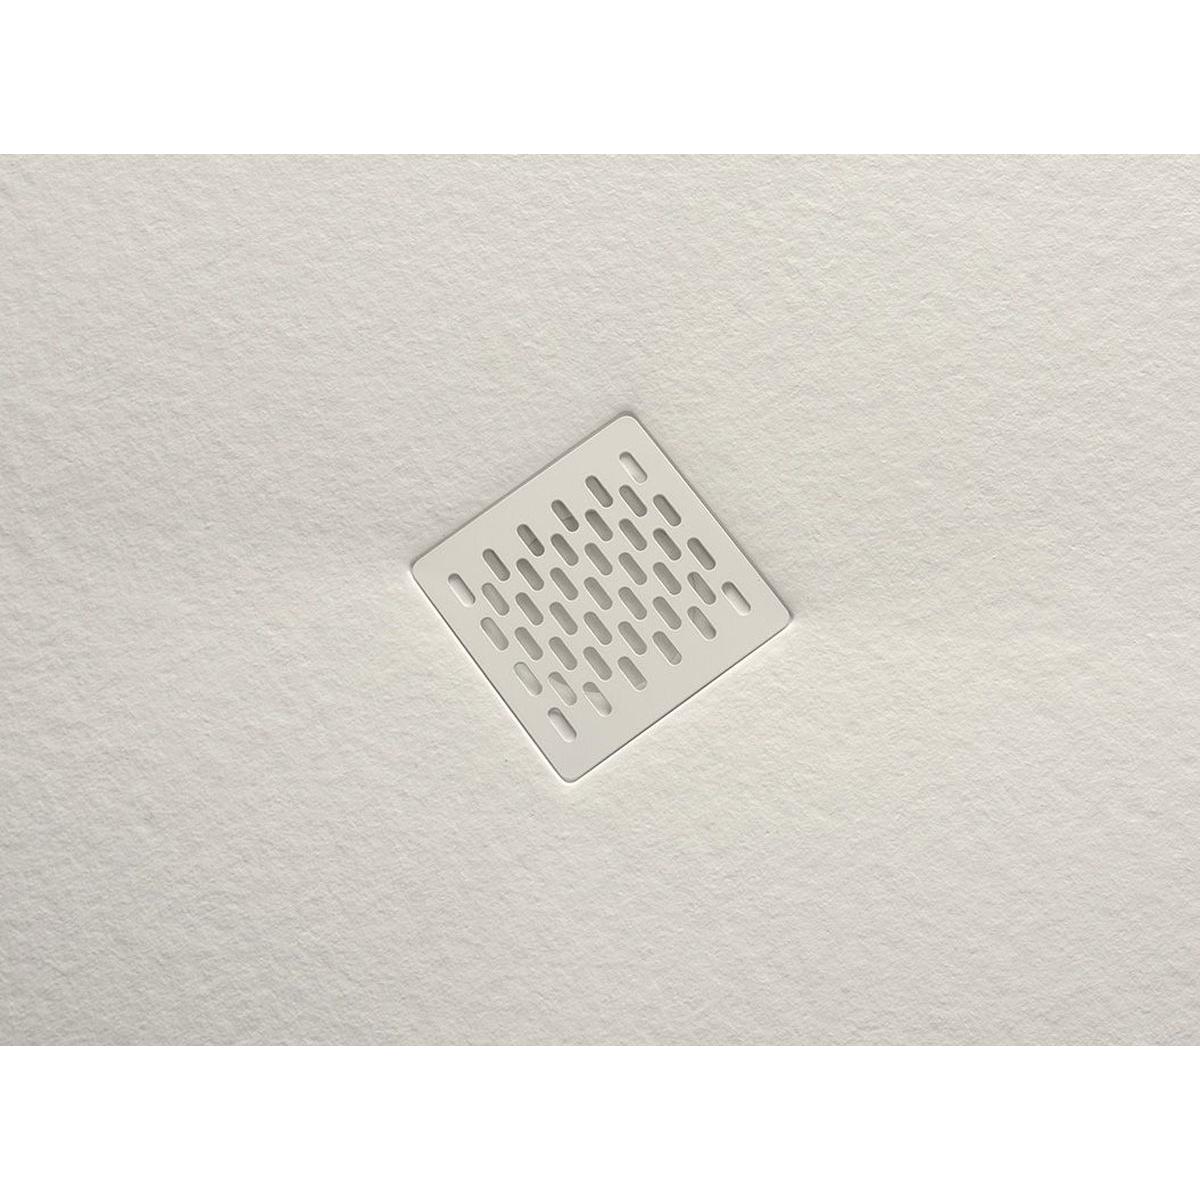 Plato de ducha rectangular 120x80 Ares Stone Nox Beige